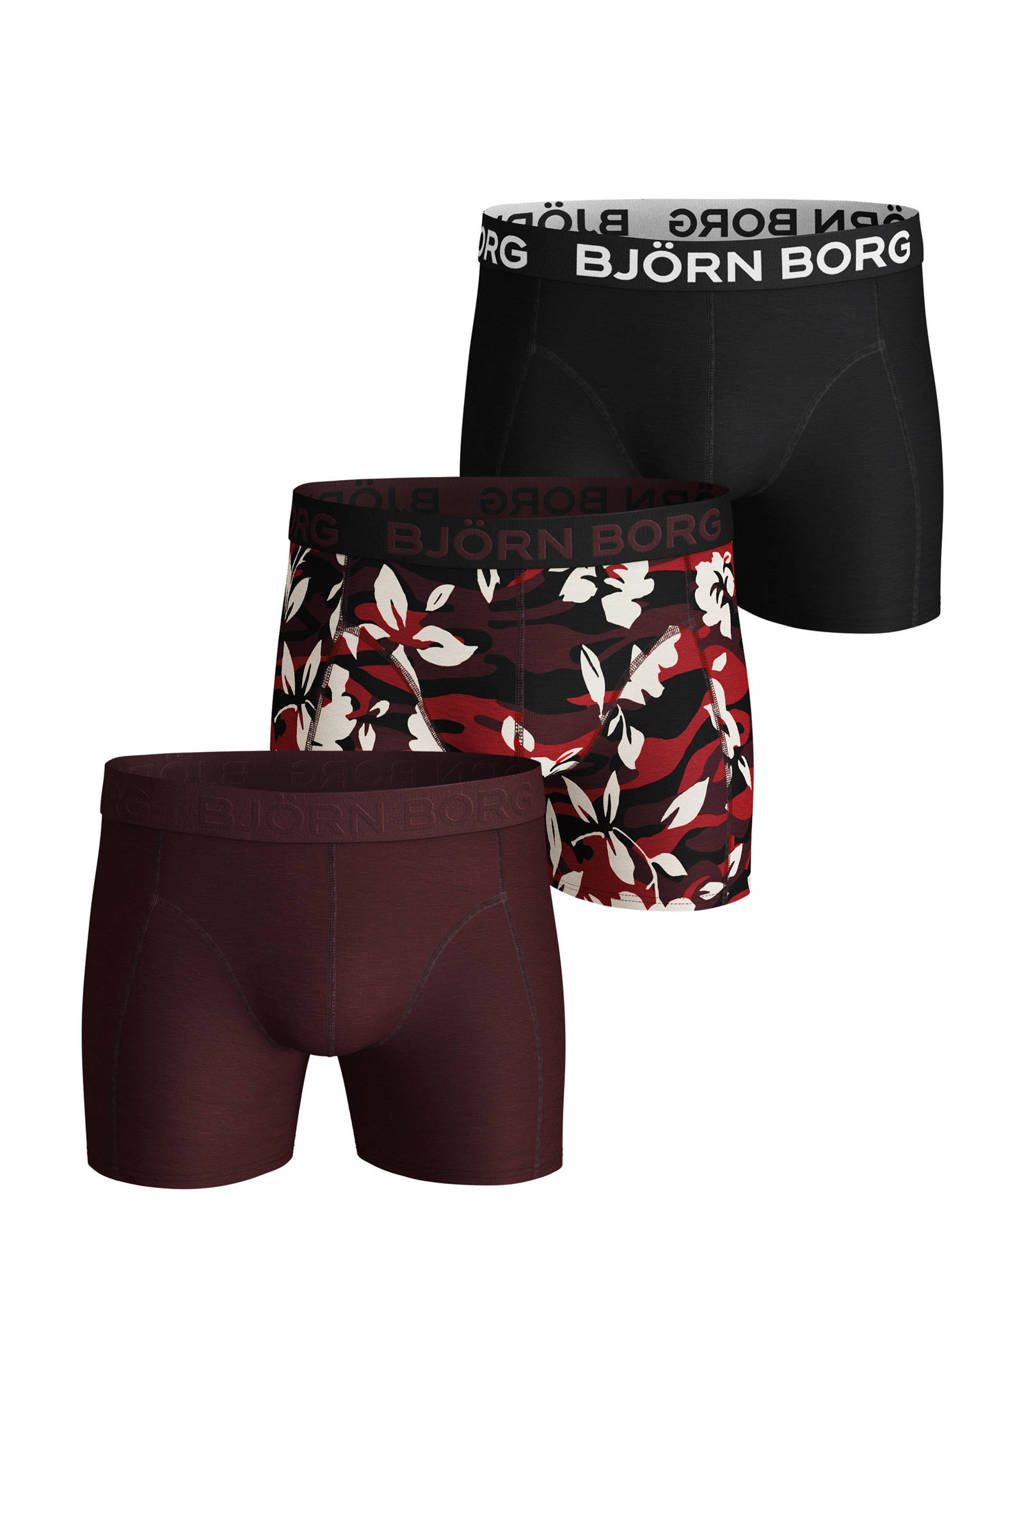 Björn Borg boxershort (set van 3), Zwart/donkerrood